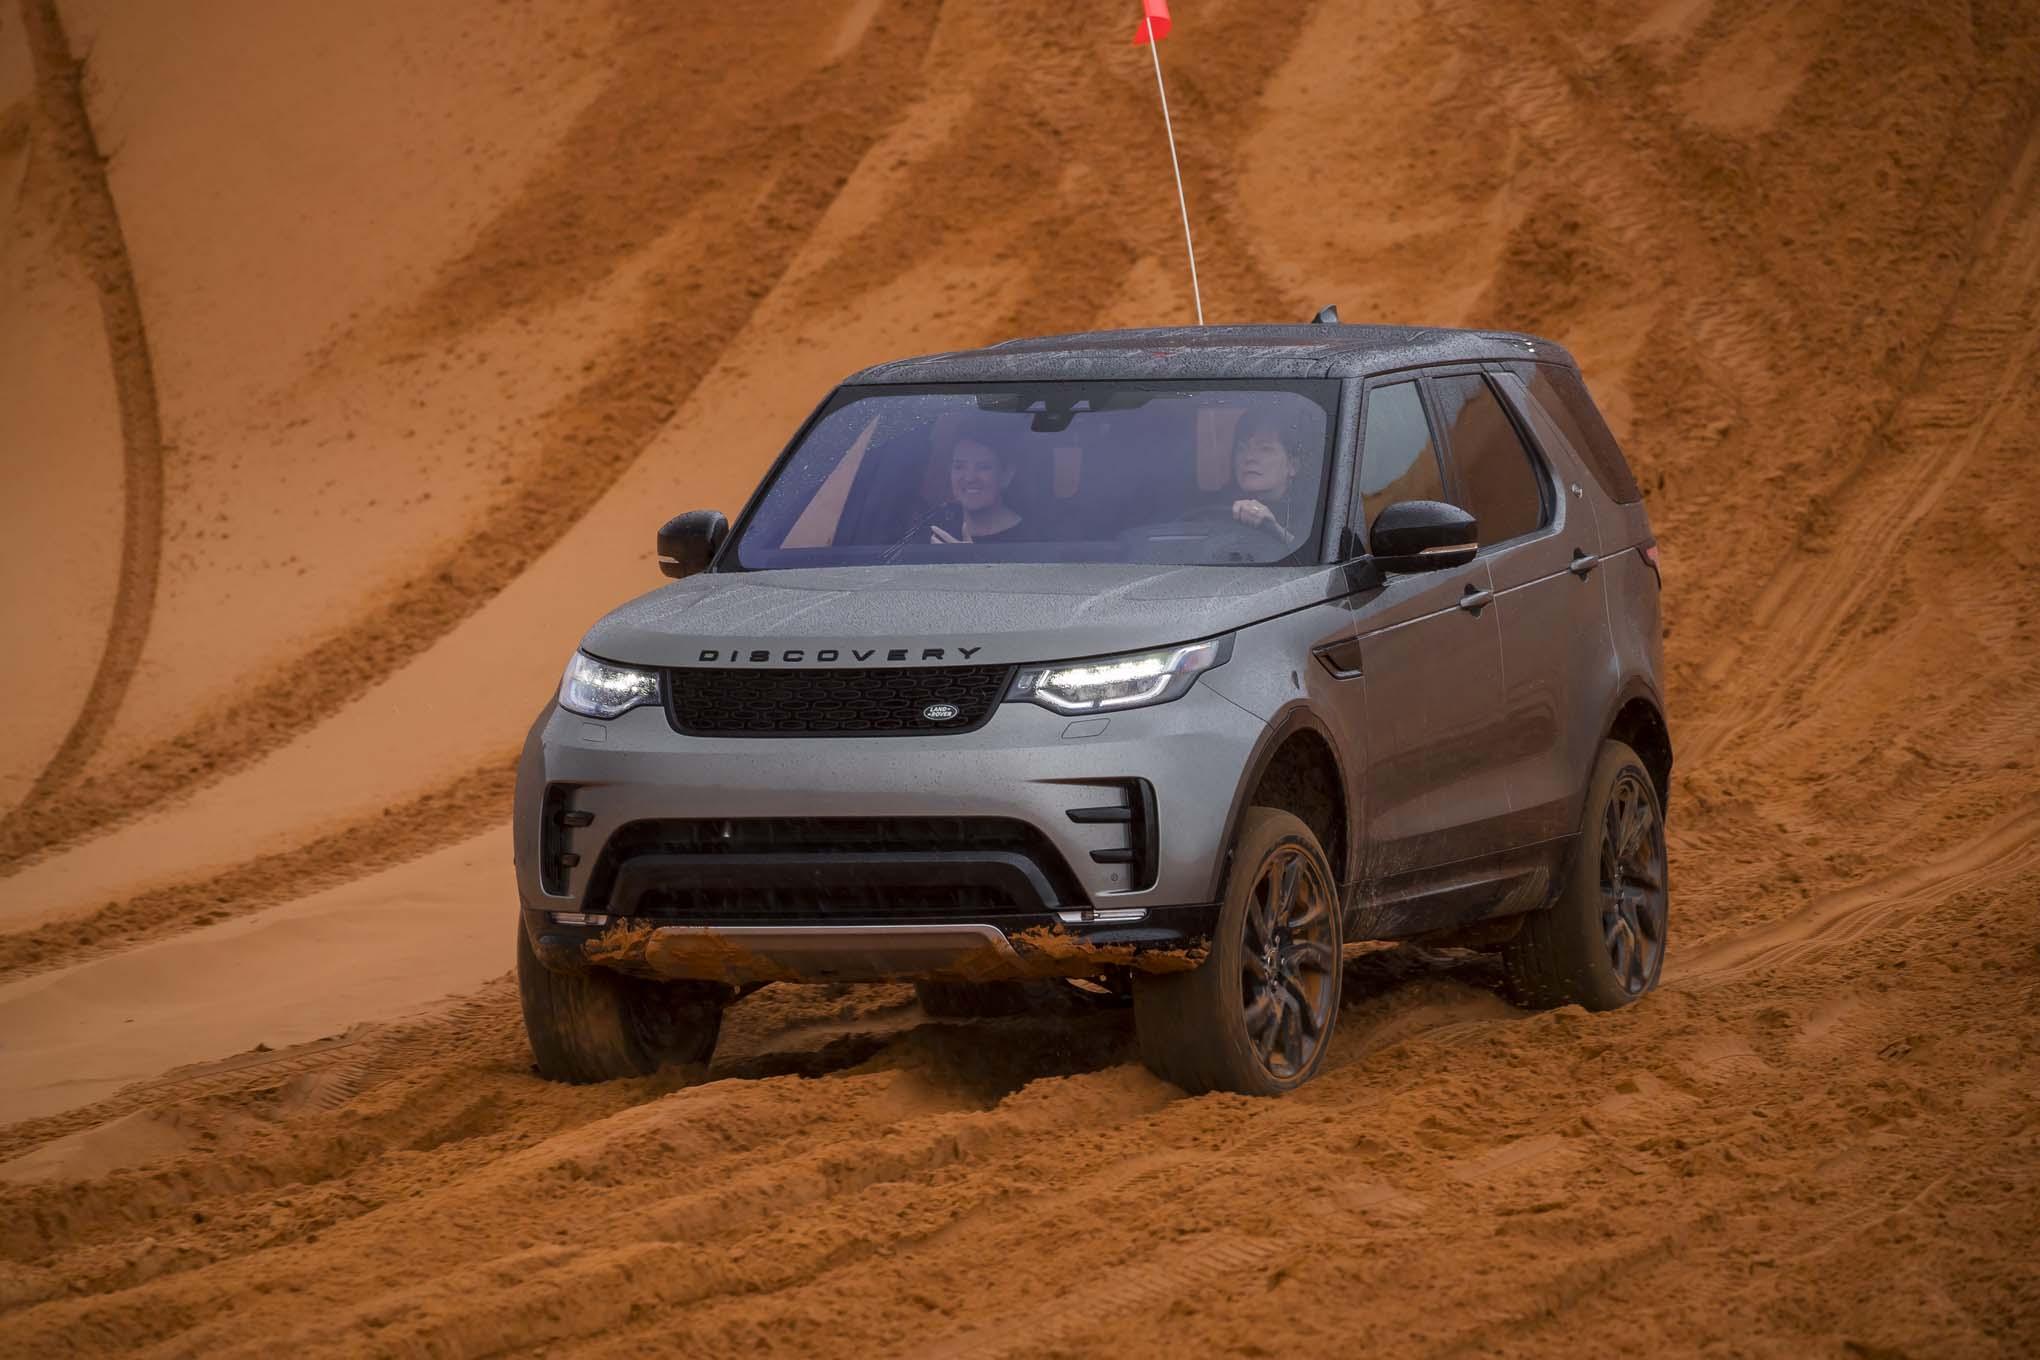 2017 Land Rover Discovery off road 38 - Motor Trend en Español